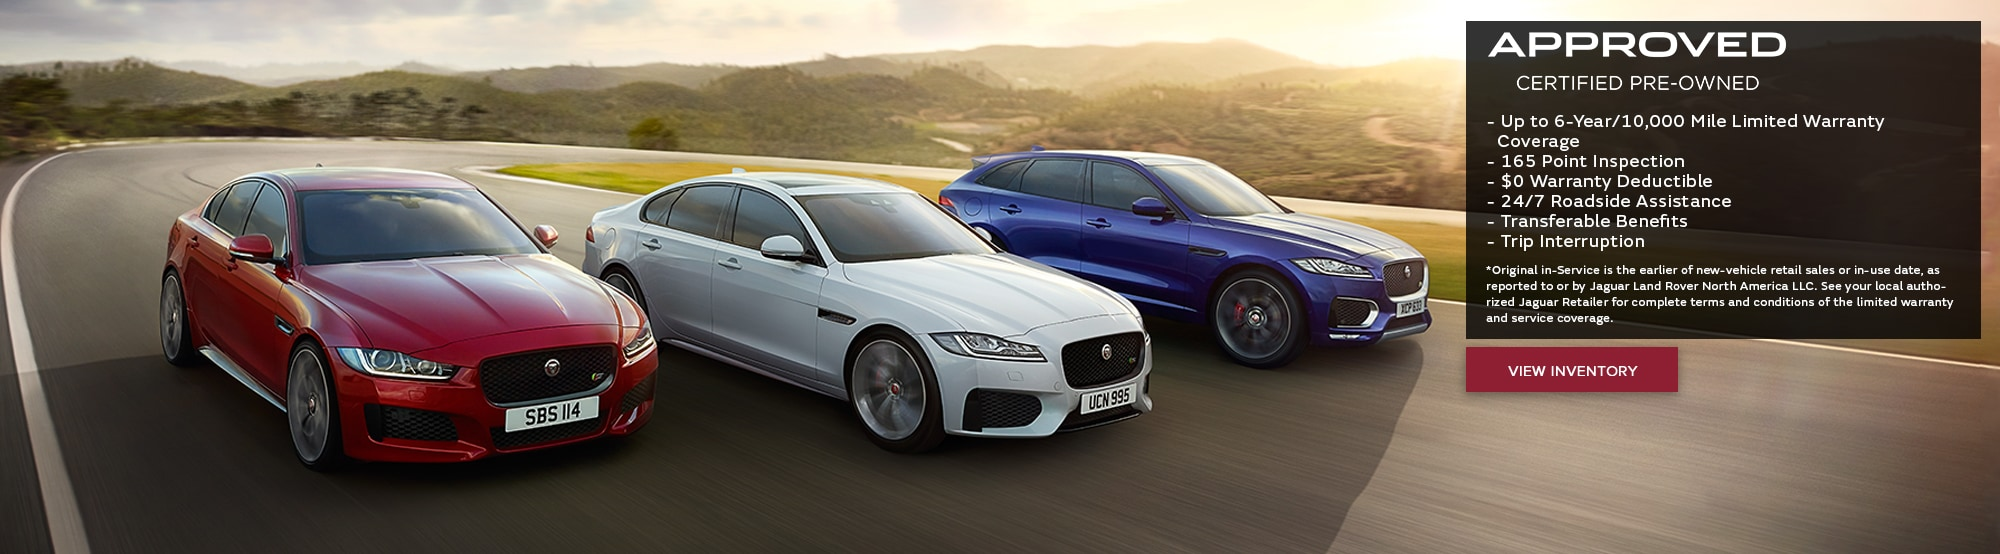 dealership xf a in htm header buy me jaguar near new scarborough sportbrake